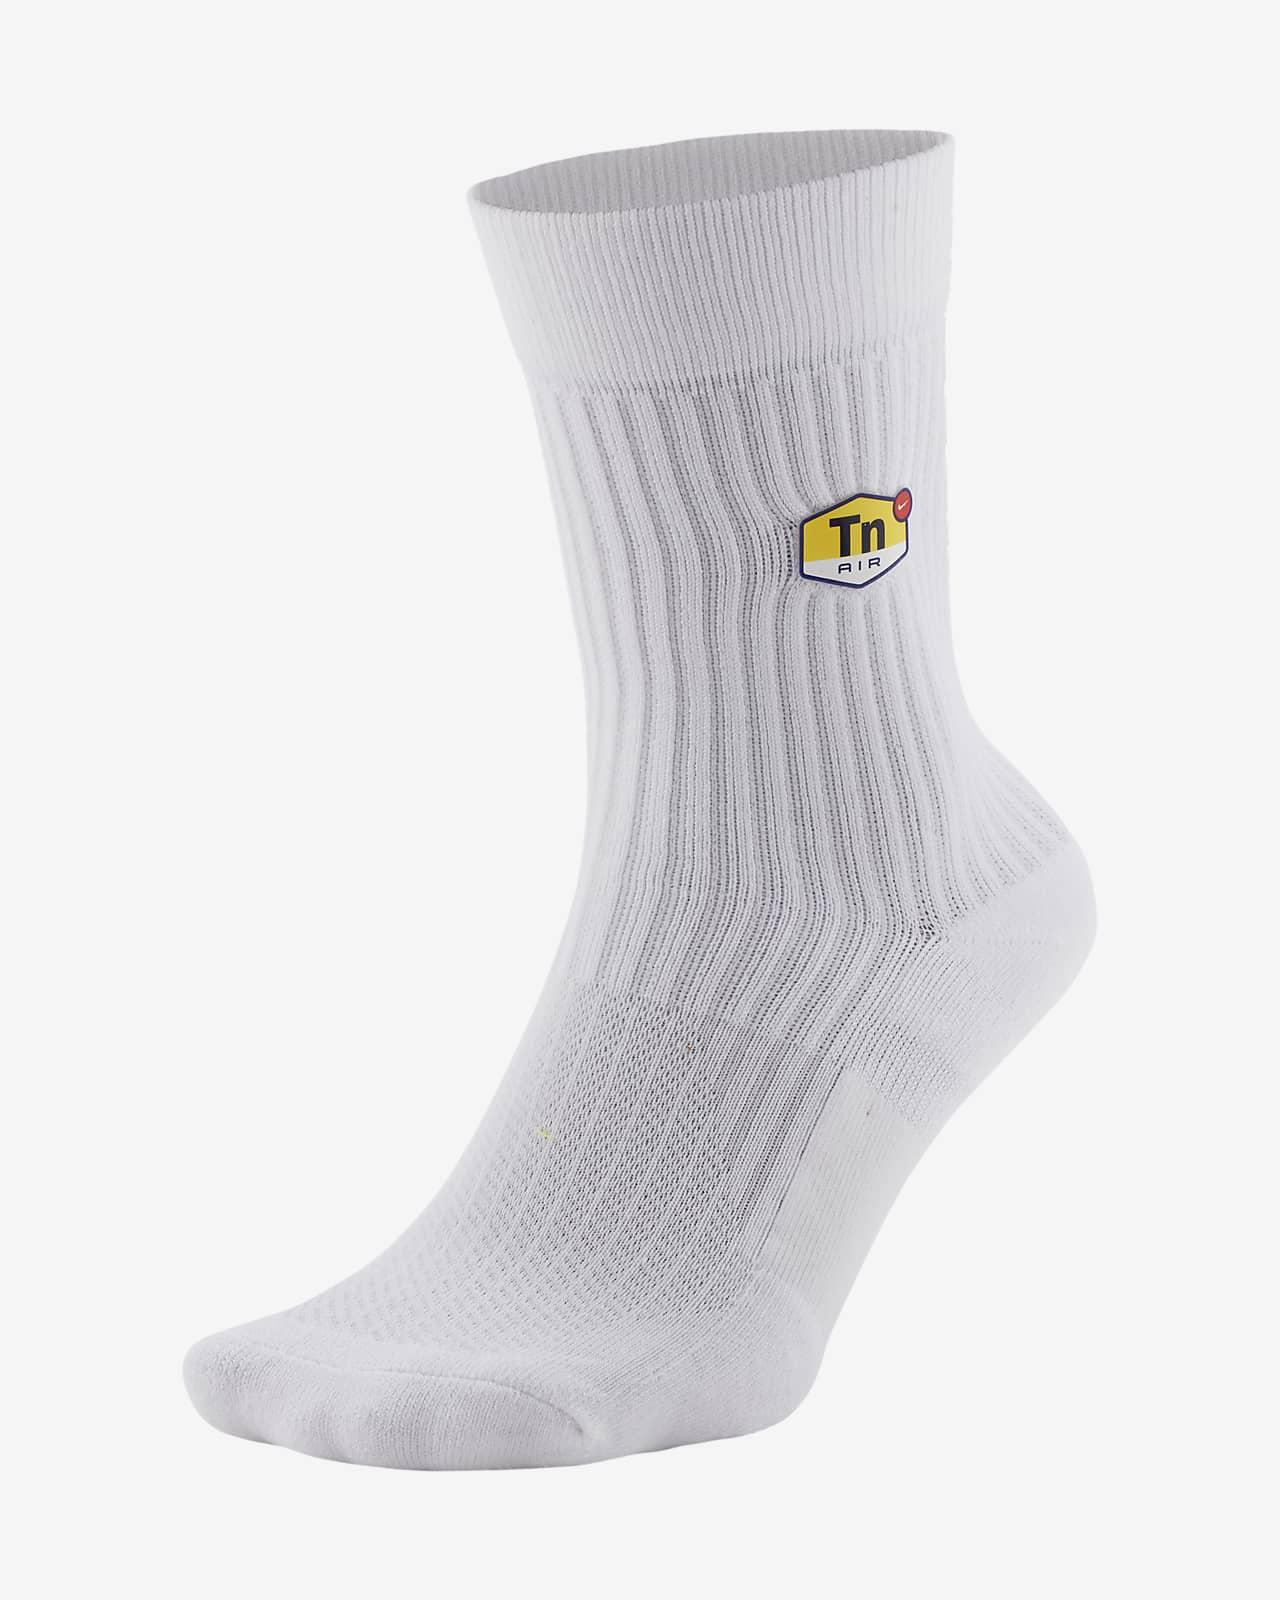 Nike SNKR Sox Crew-Socken